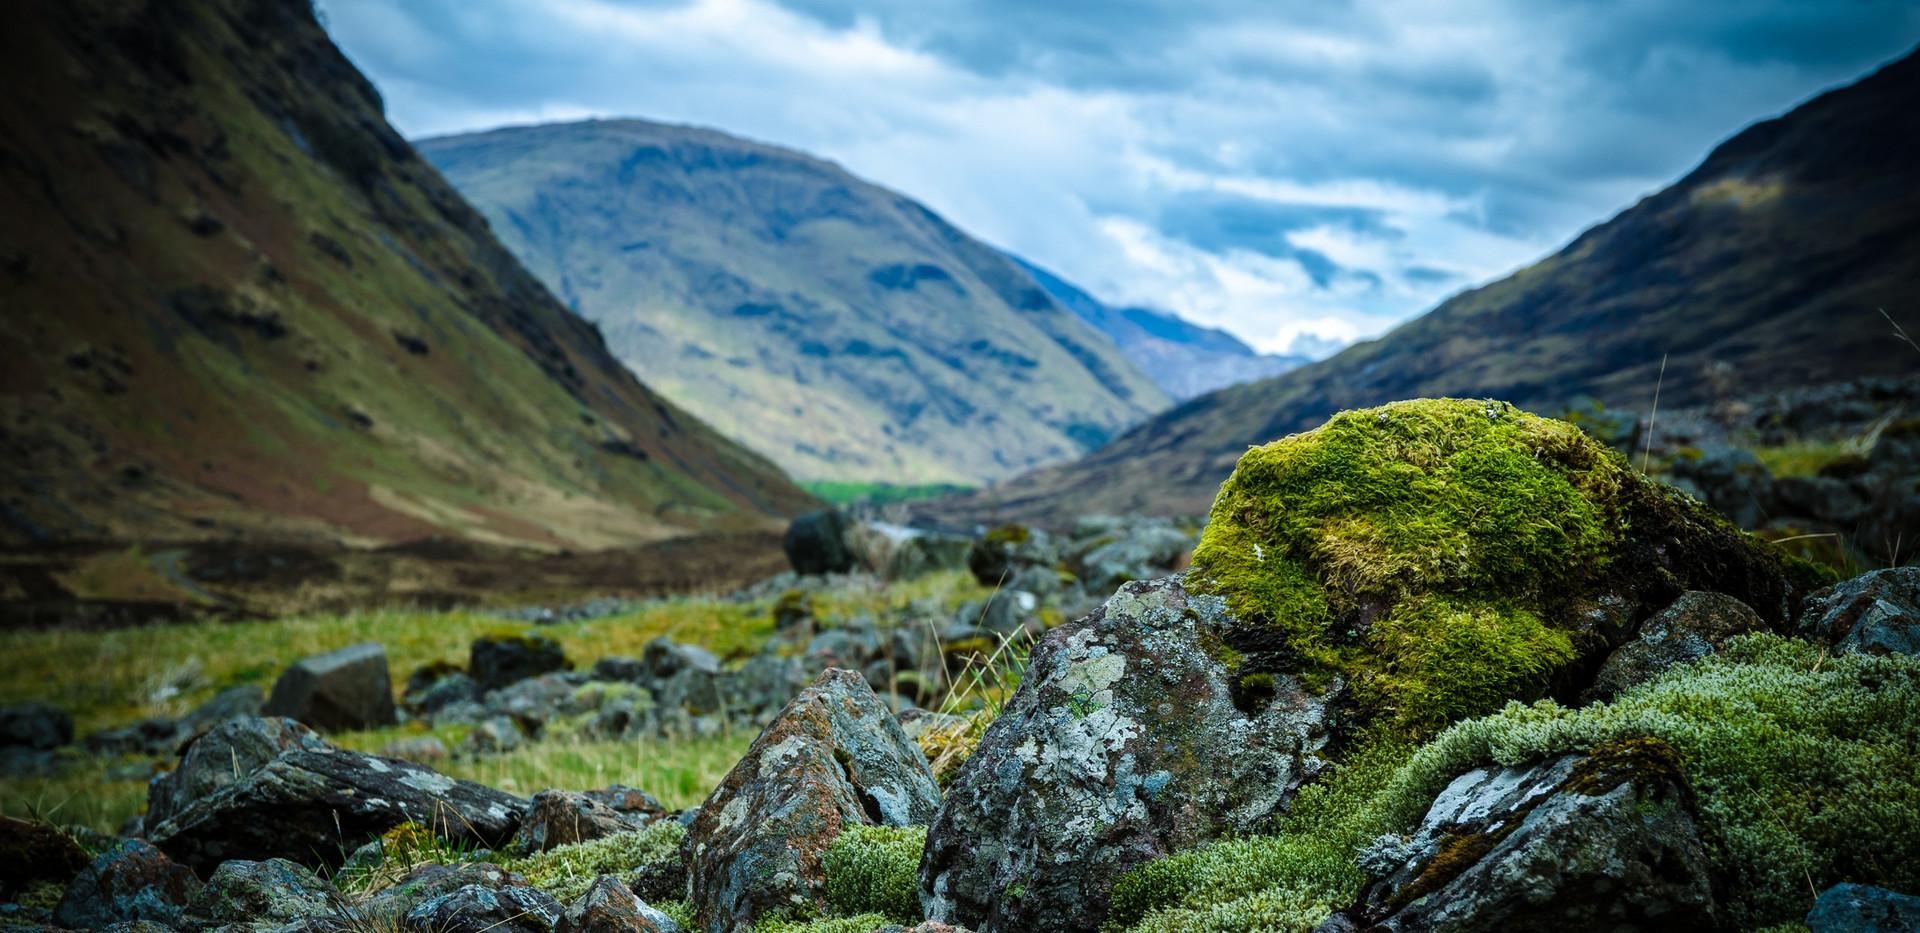 scottish-highlands-mountains-hd-wallpape